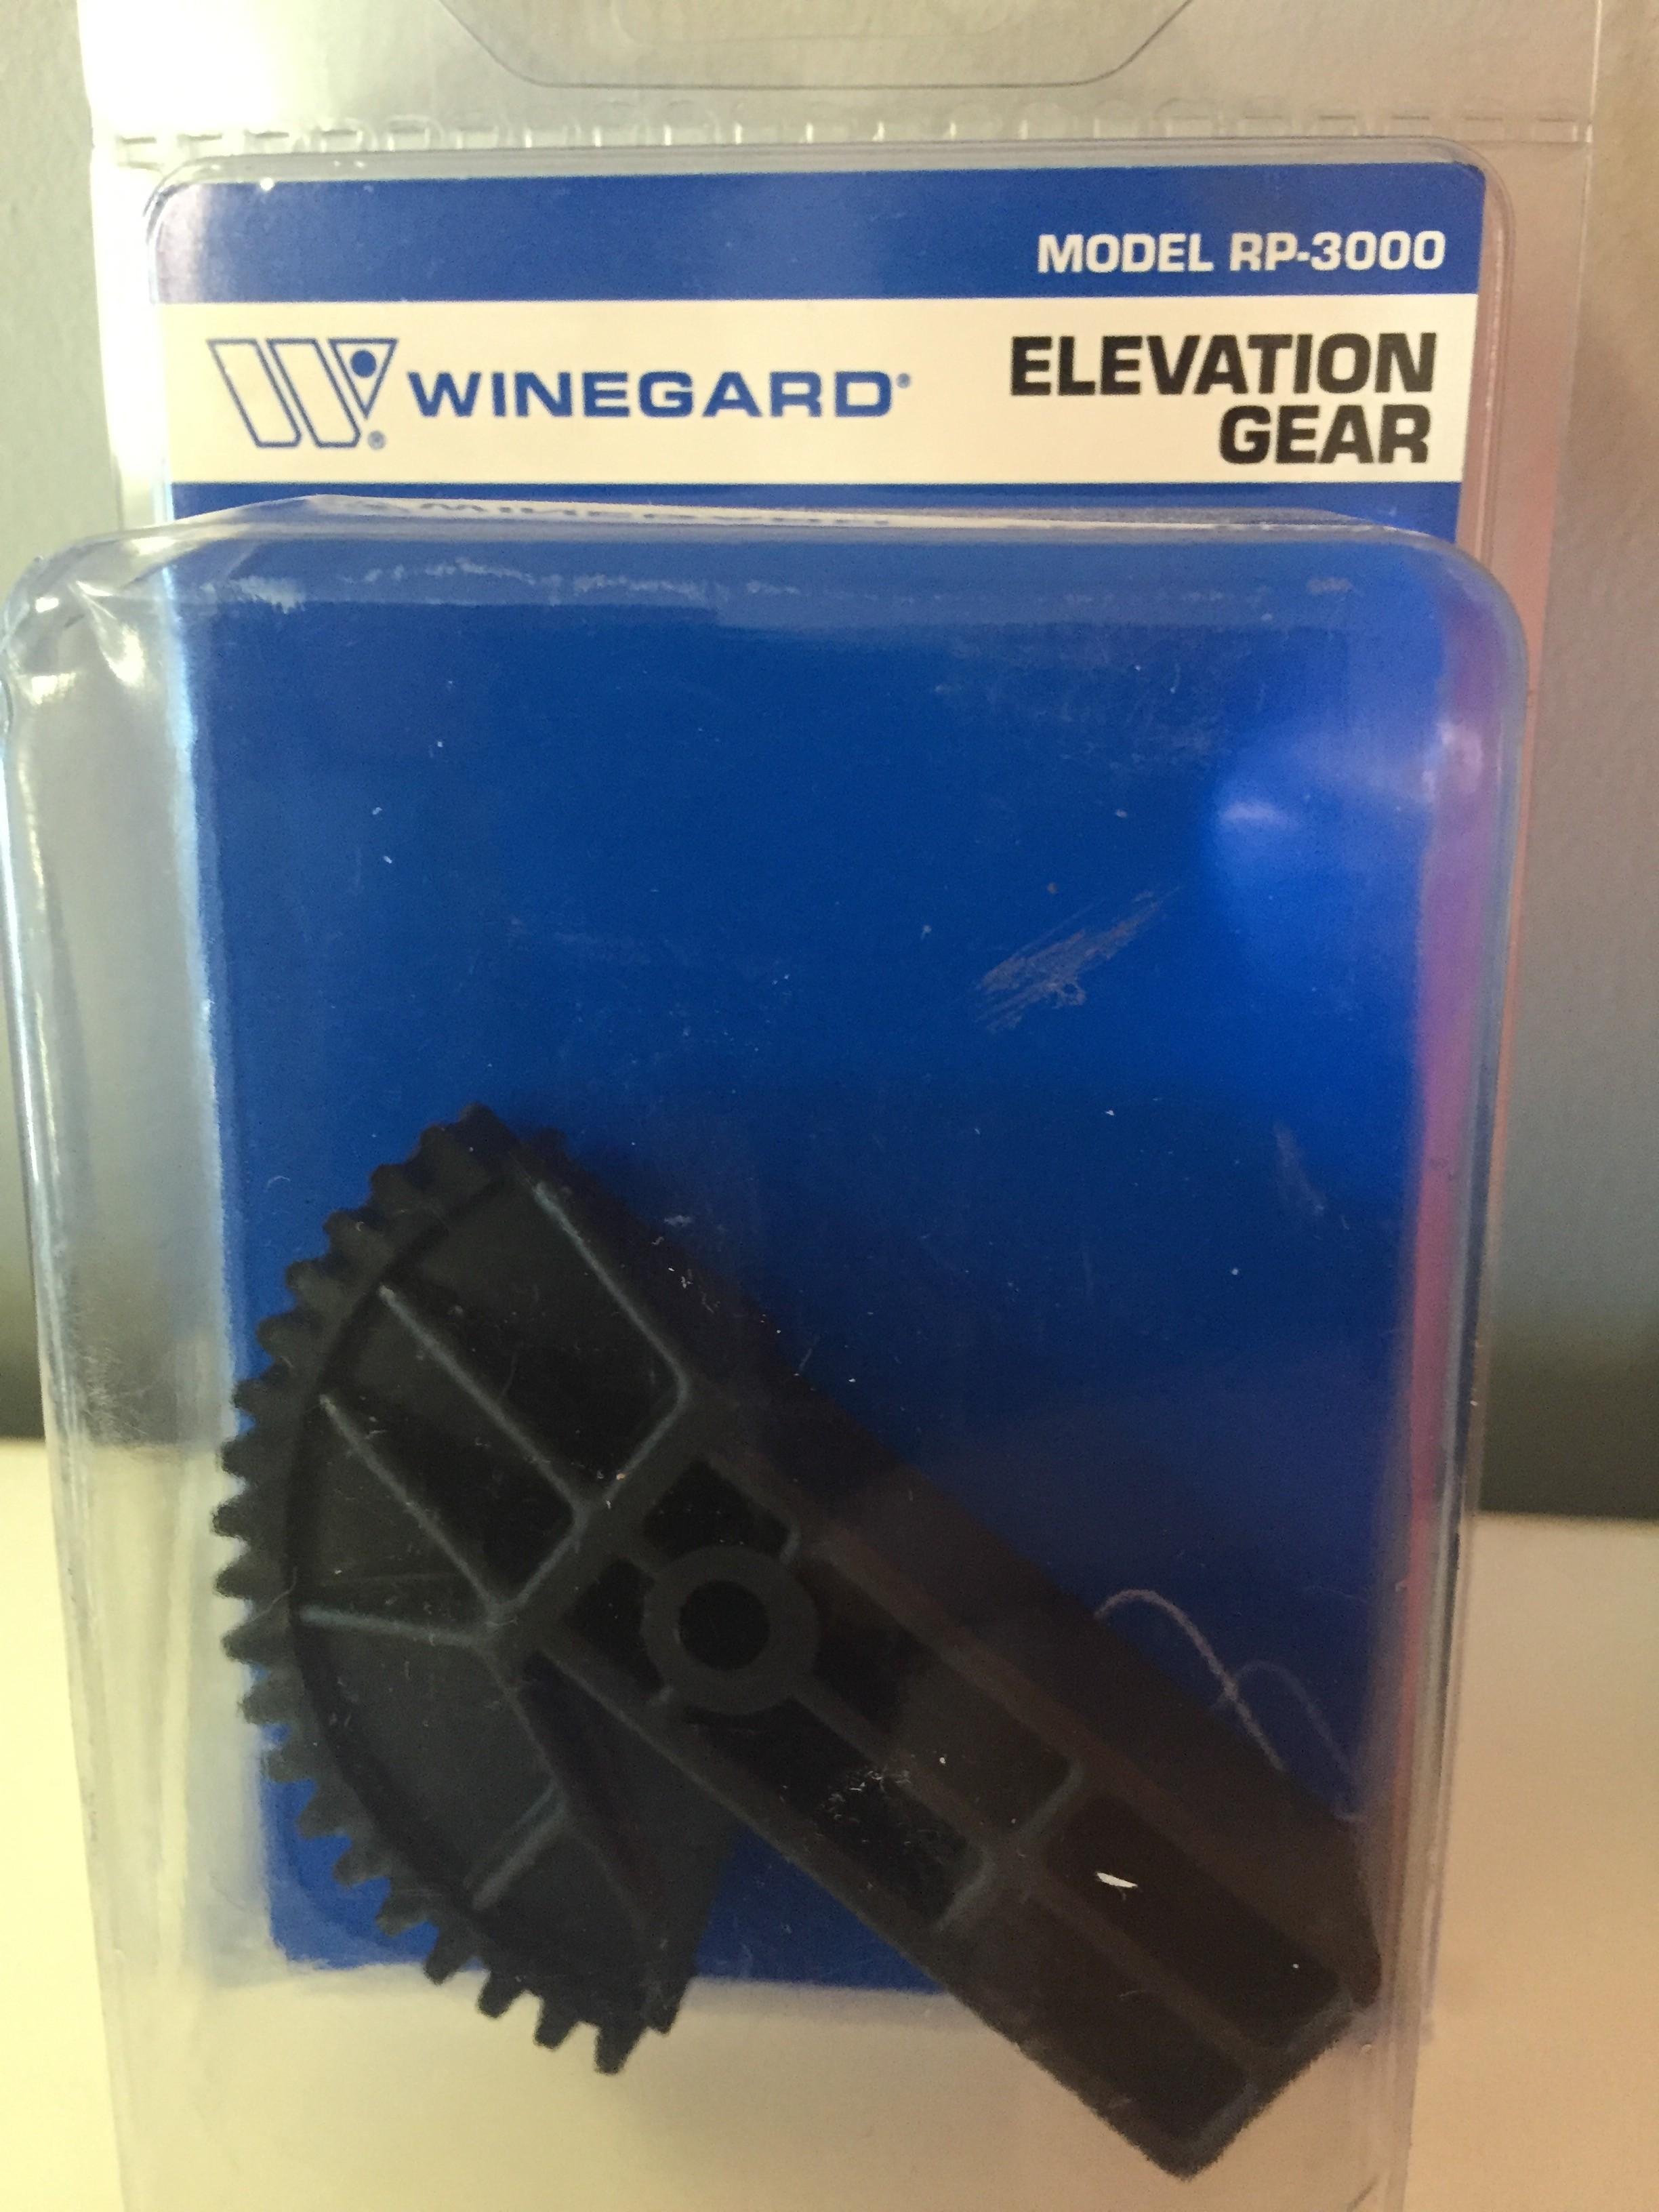 Winegard elevating Plastic gear